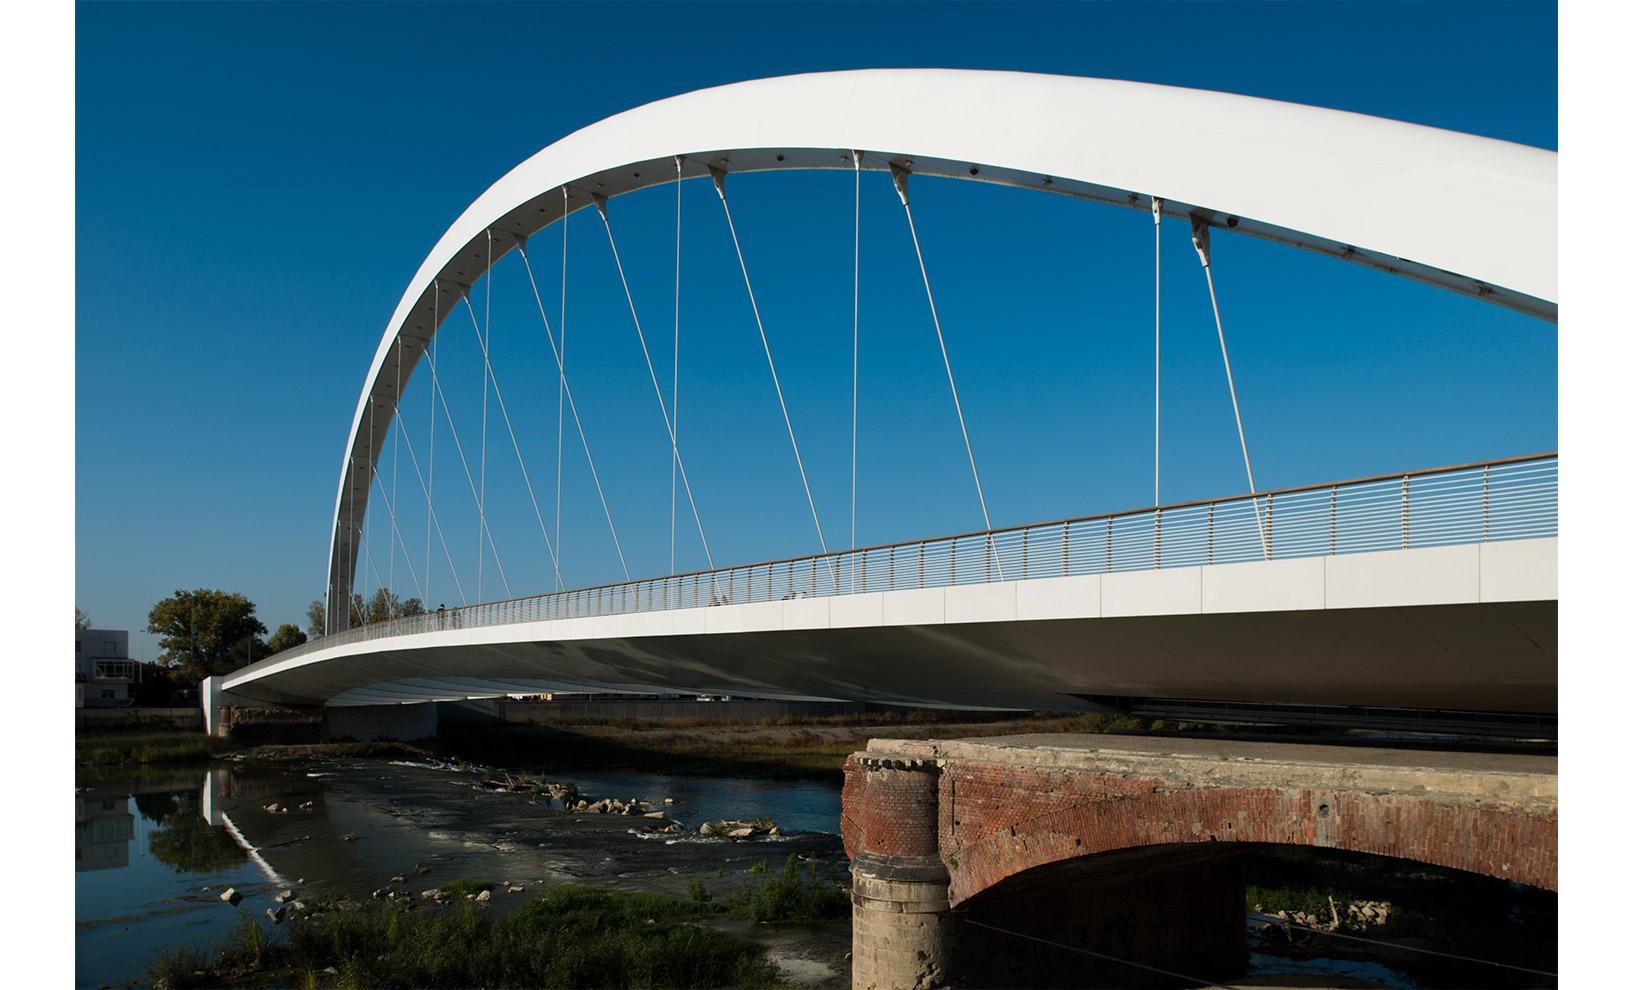 ©marco-tacchini-fotografo-ponte-cittadella-richar-meier-and-partners_13